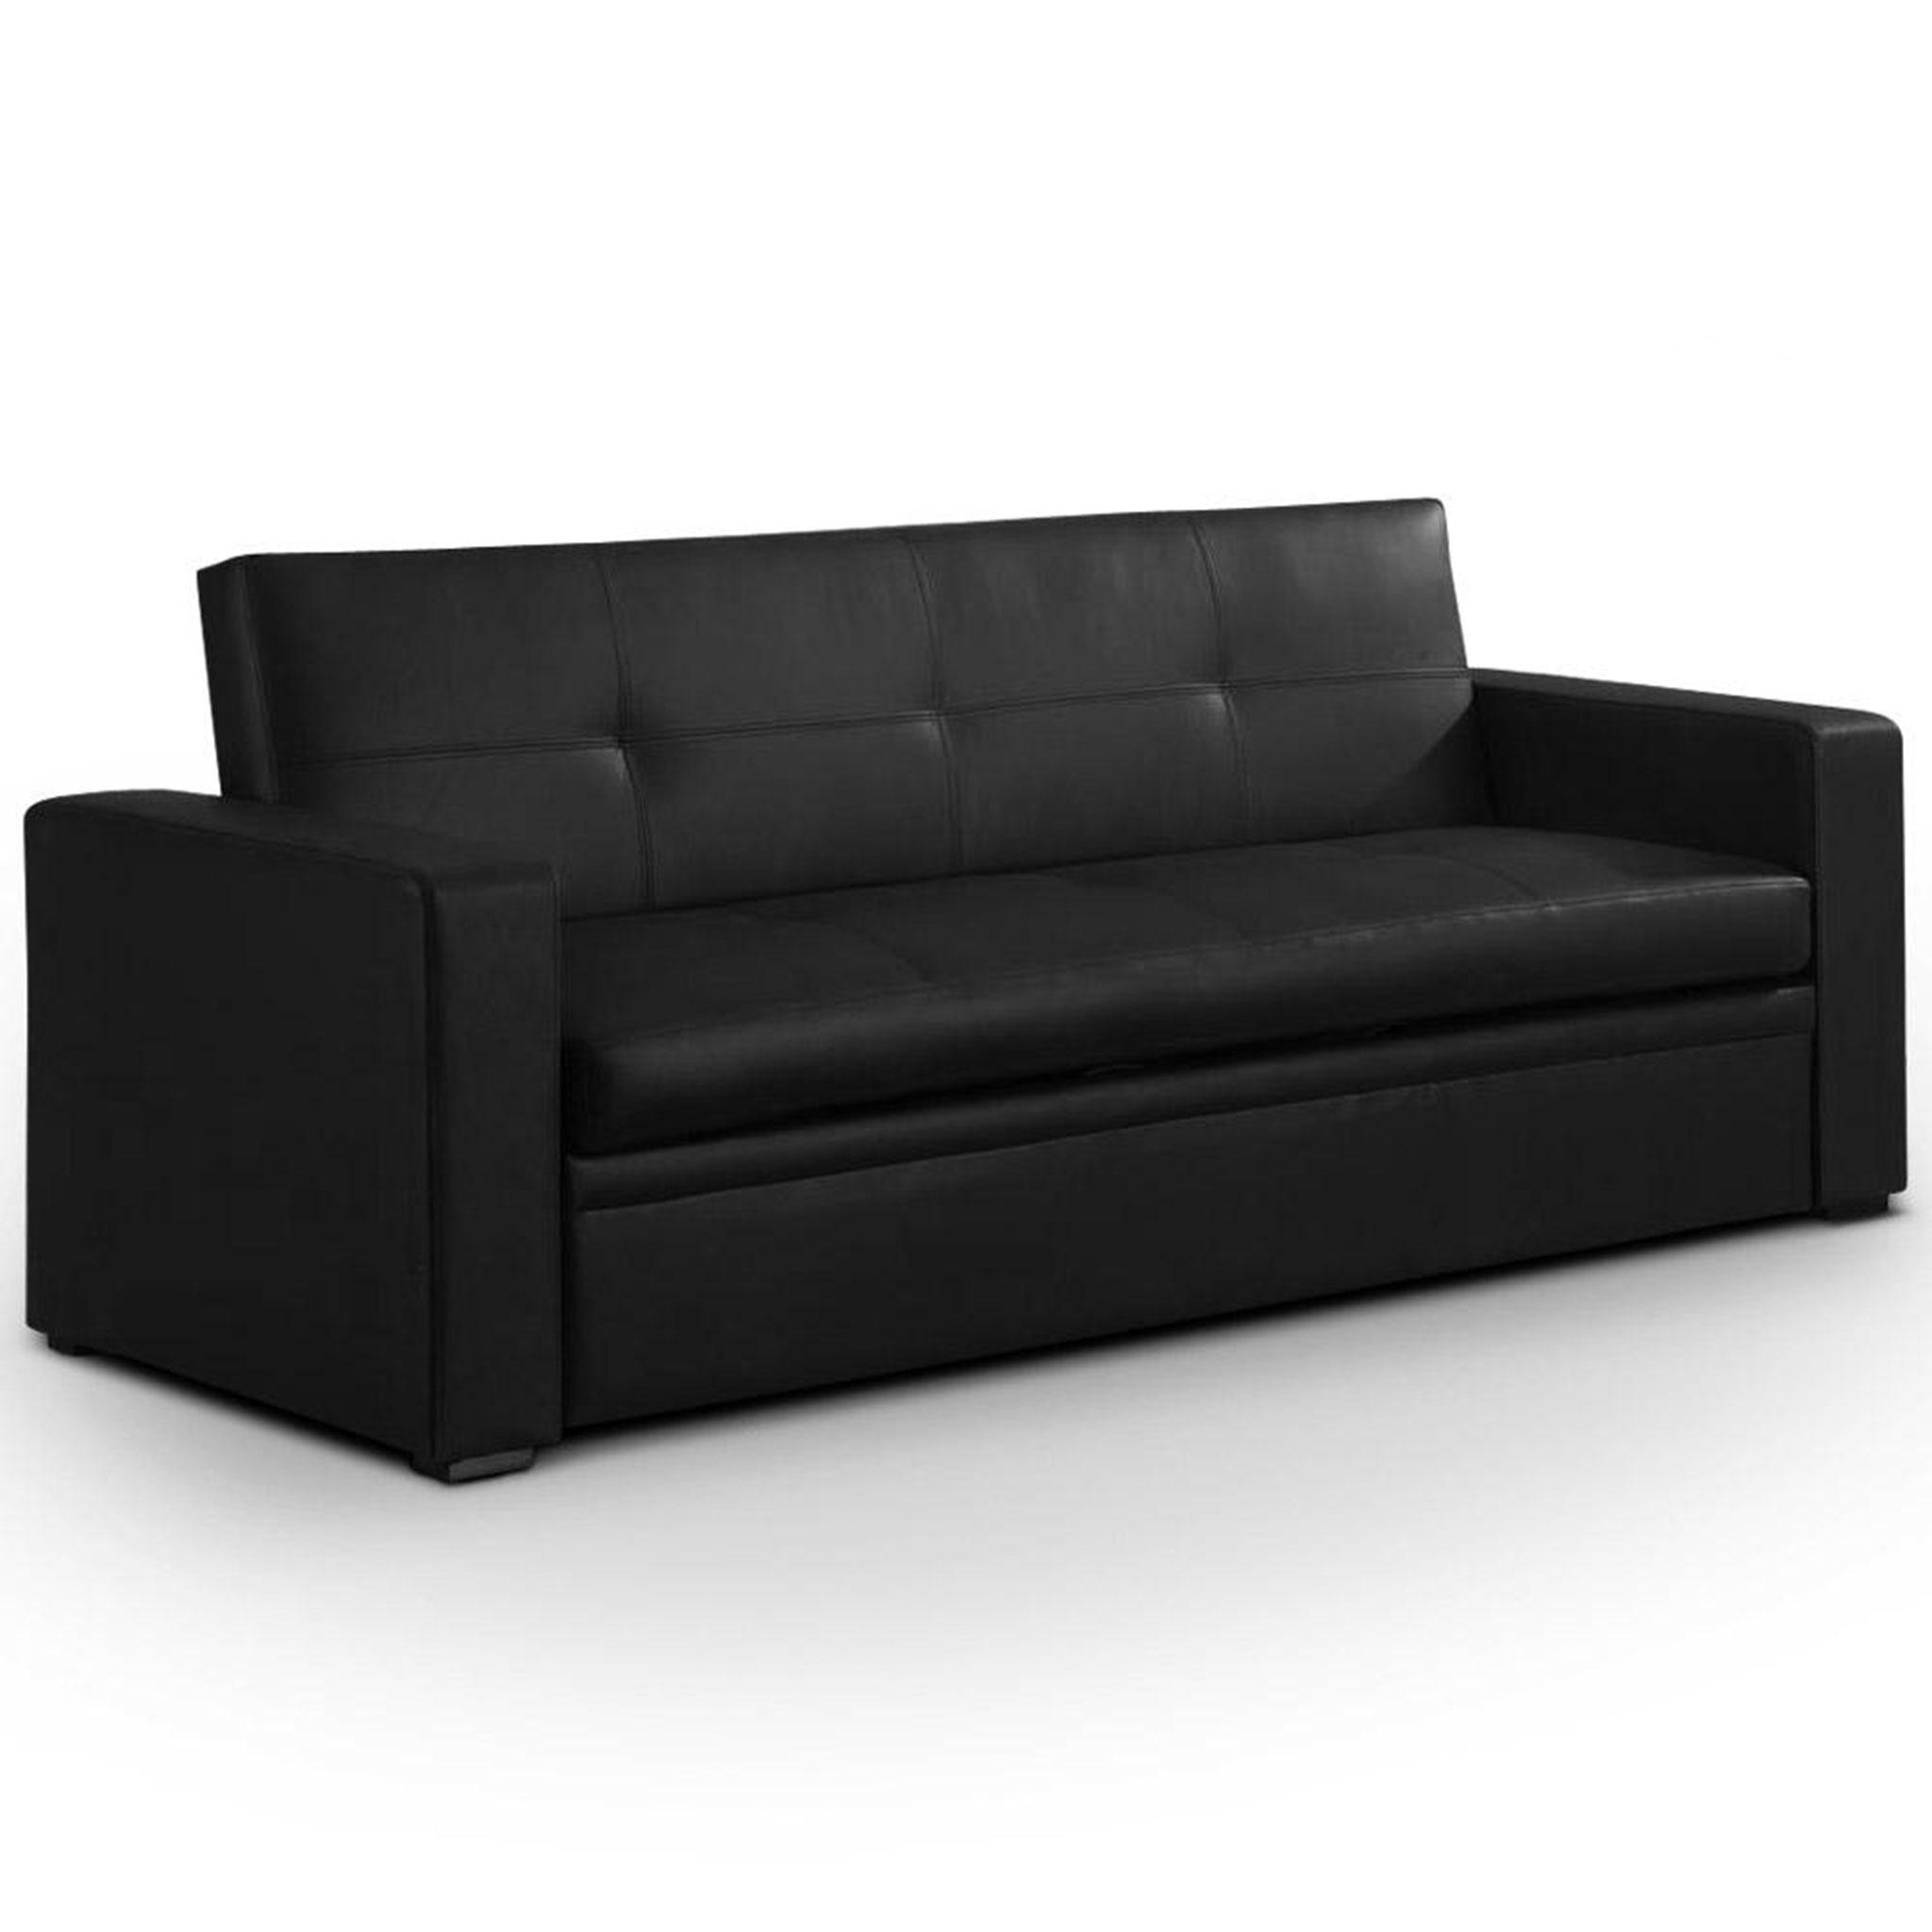 Canapé Convertible Simili Cuir Pas Cher Luxe Image Canap Convertible 3 Places Conforama 6 Cuir 1 Avec S Et Full